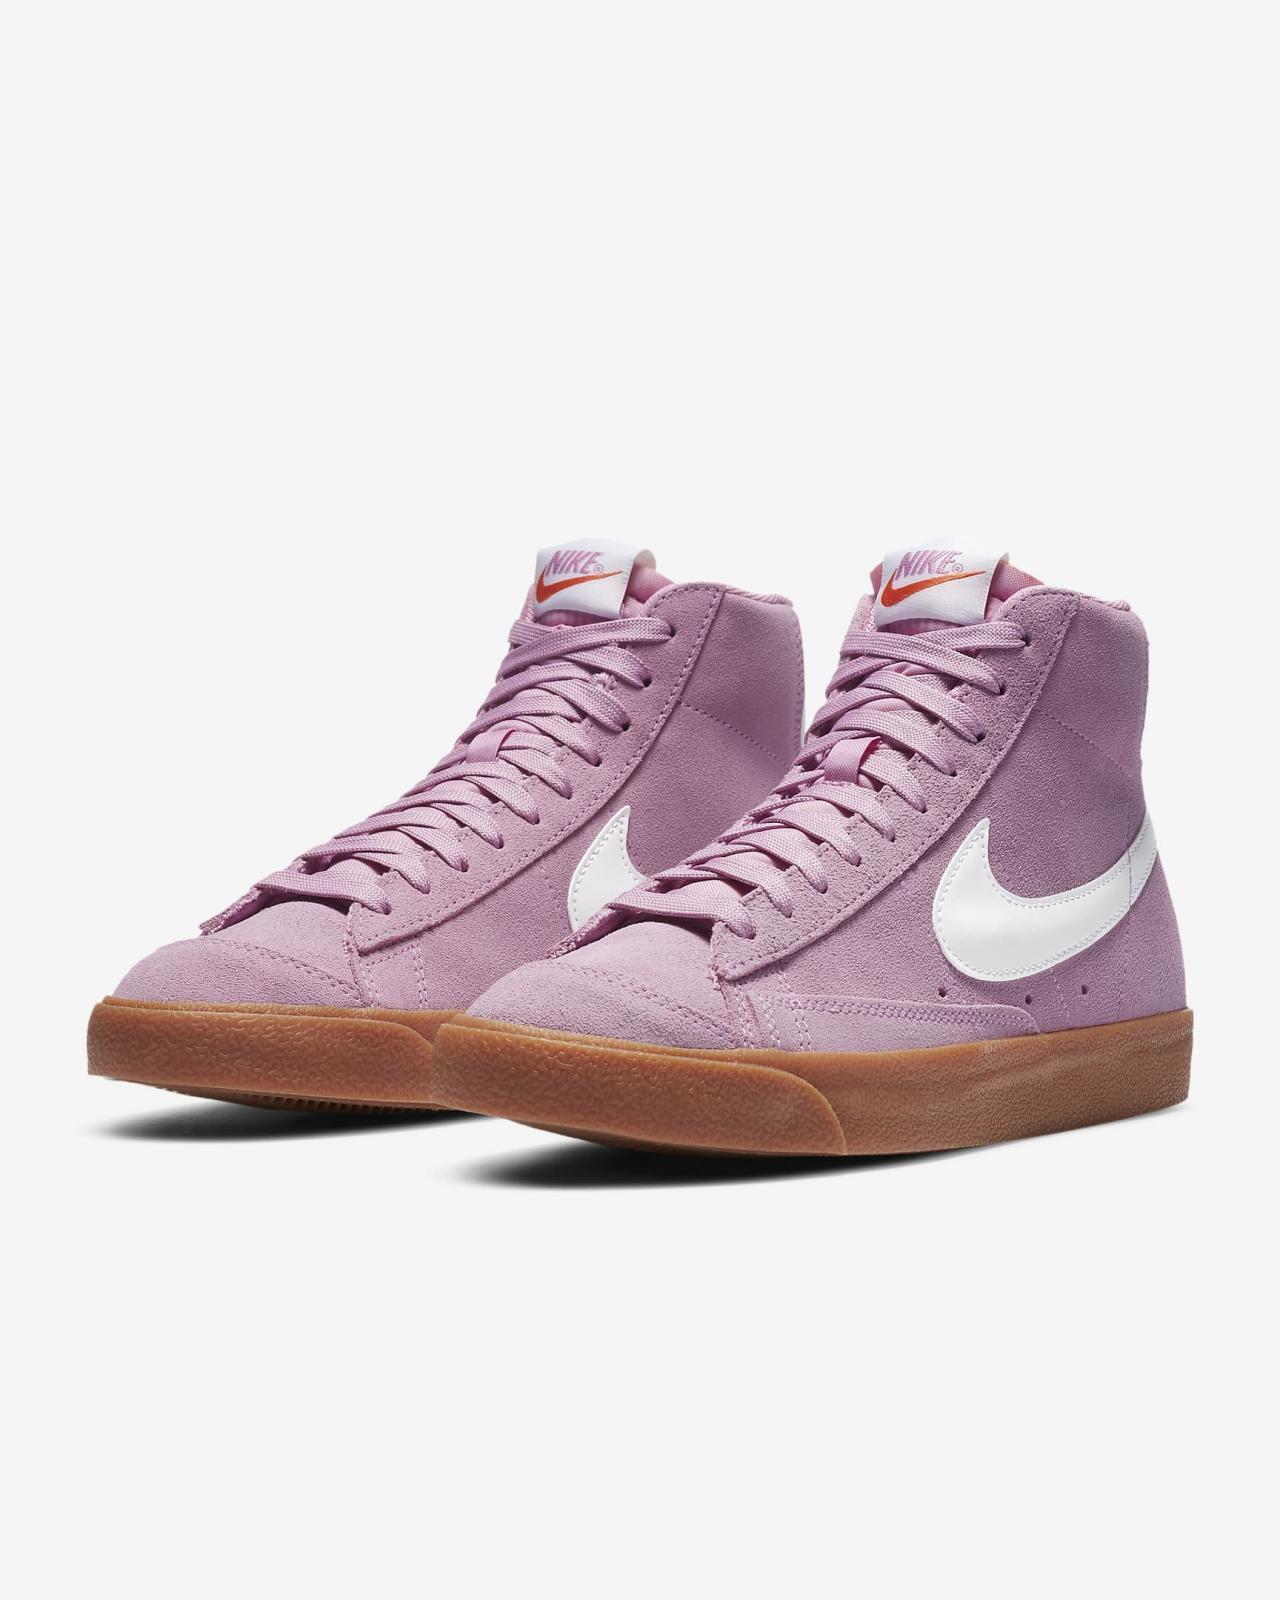 Nike Sportswear推出超粉/橡皮中褐/荷兰橙/白色WMNS Blazer Mid '77 Suede